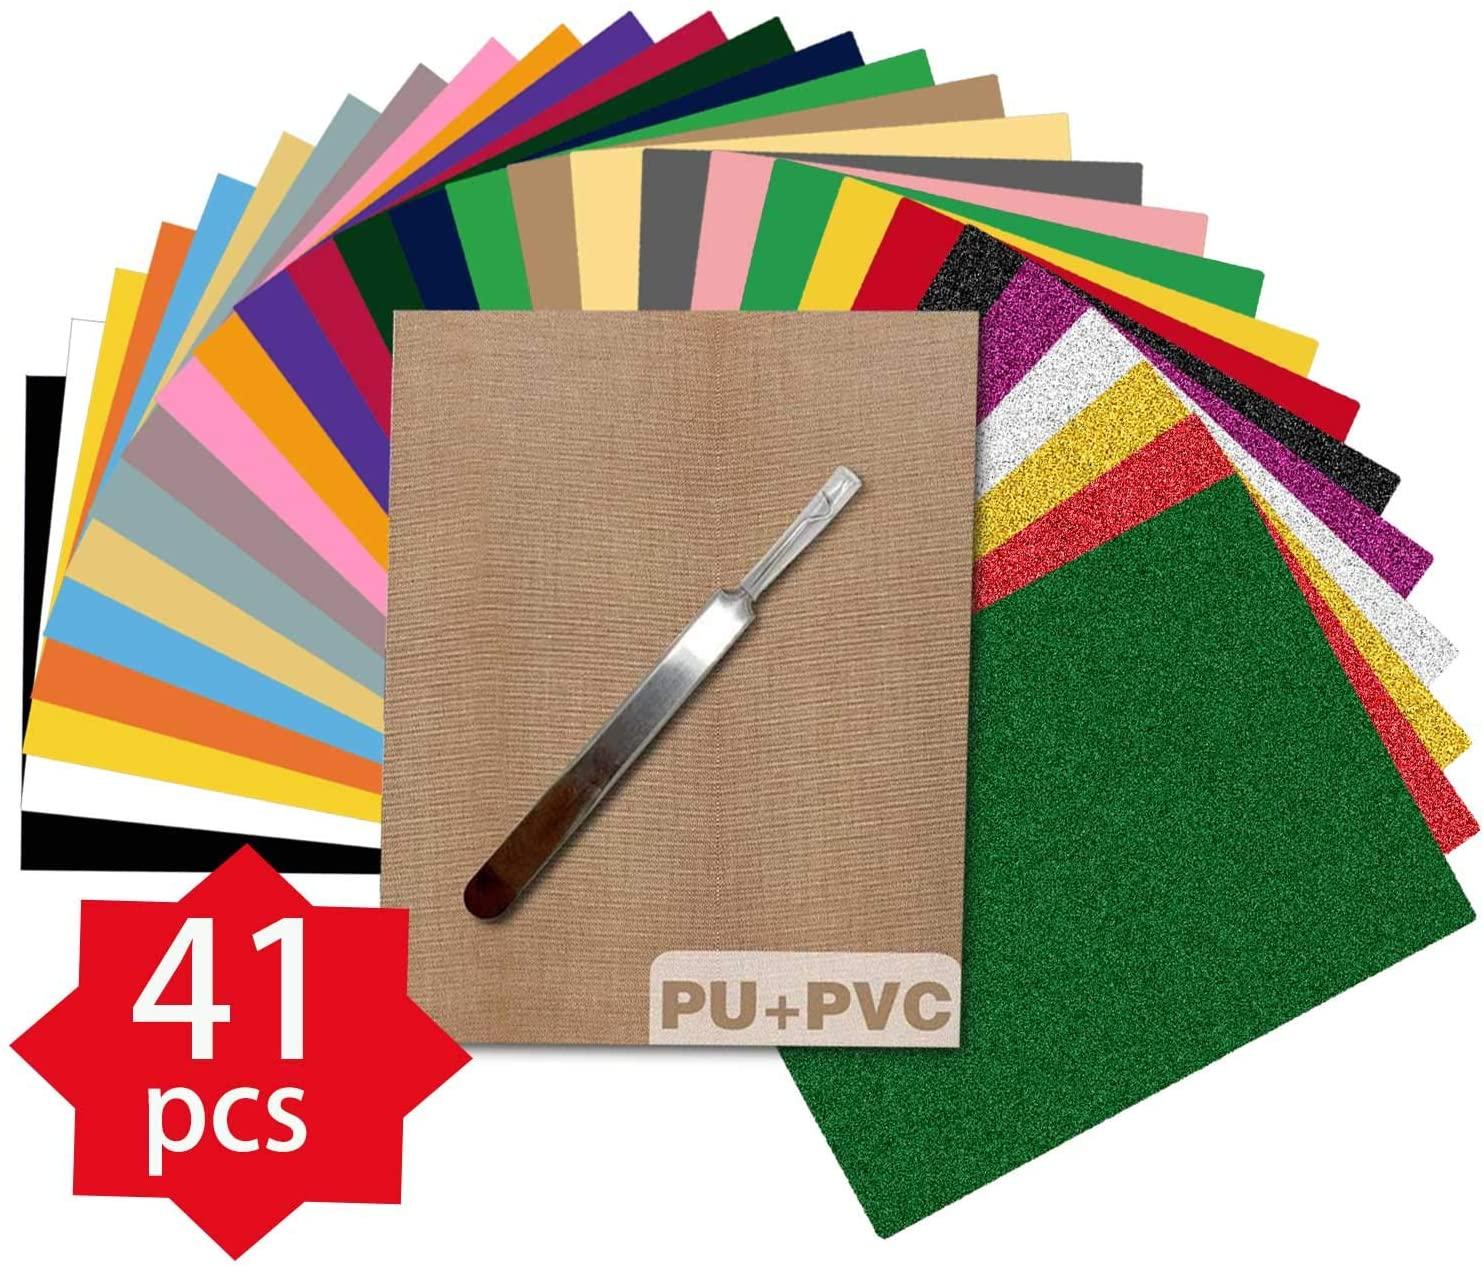 HTV Heat Transfer Vinyl Bundle, 33Pack Assorted Colors 12x10 Sheets+ 6 Glitter Sheet Iron on Vinyl for DIY T-Shirts for Cricut & Heat Press Machine